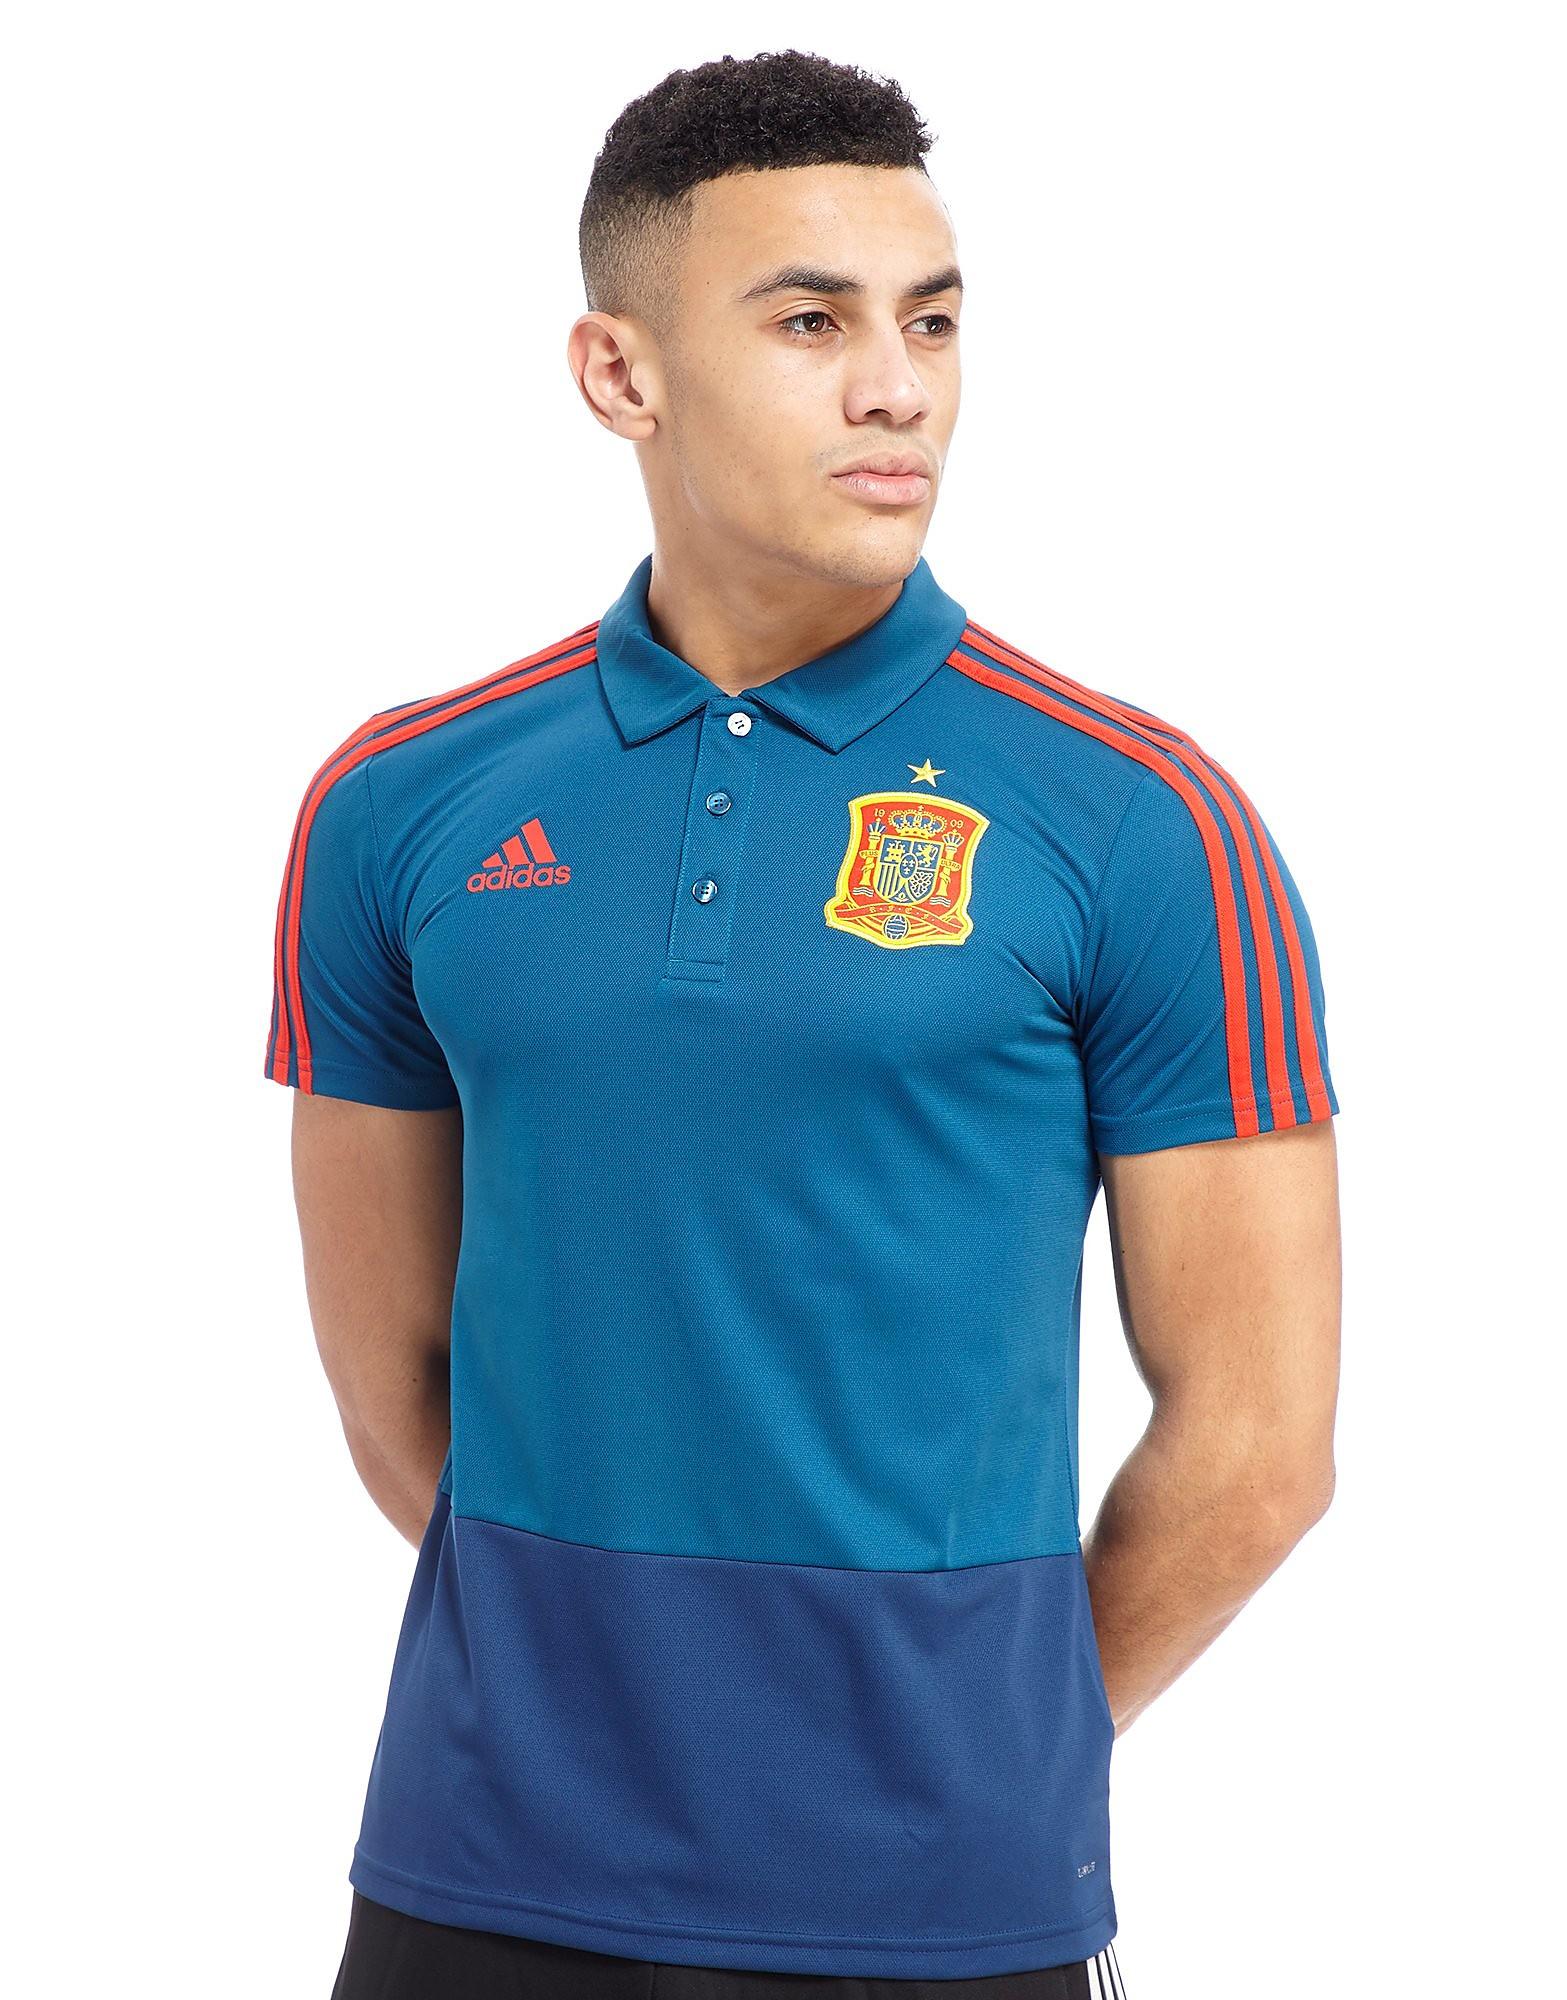 adidas Spain 2018 Polo Shirt